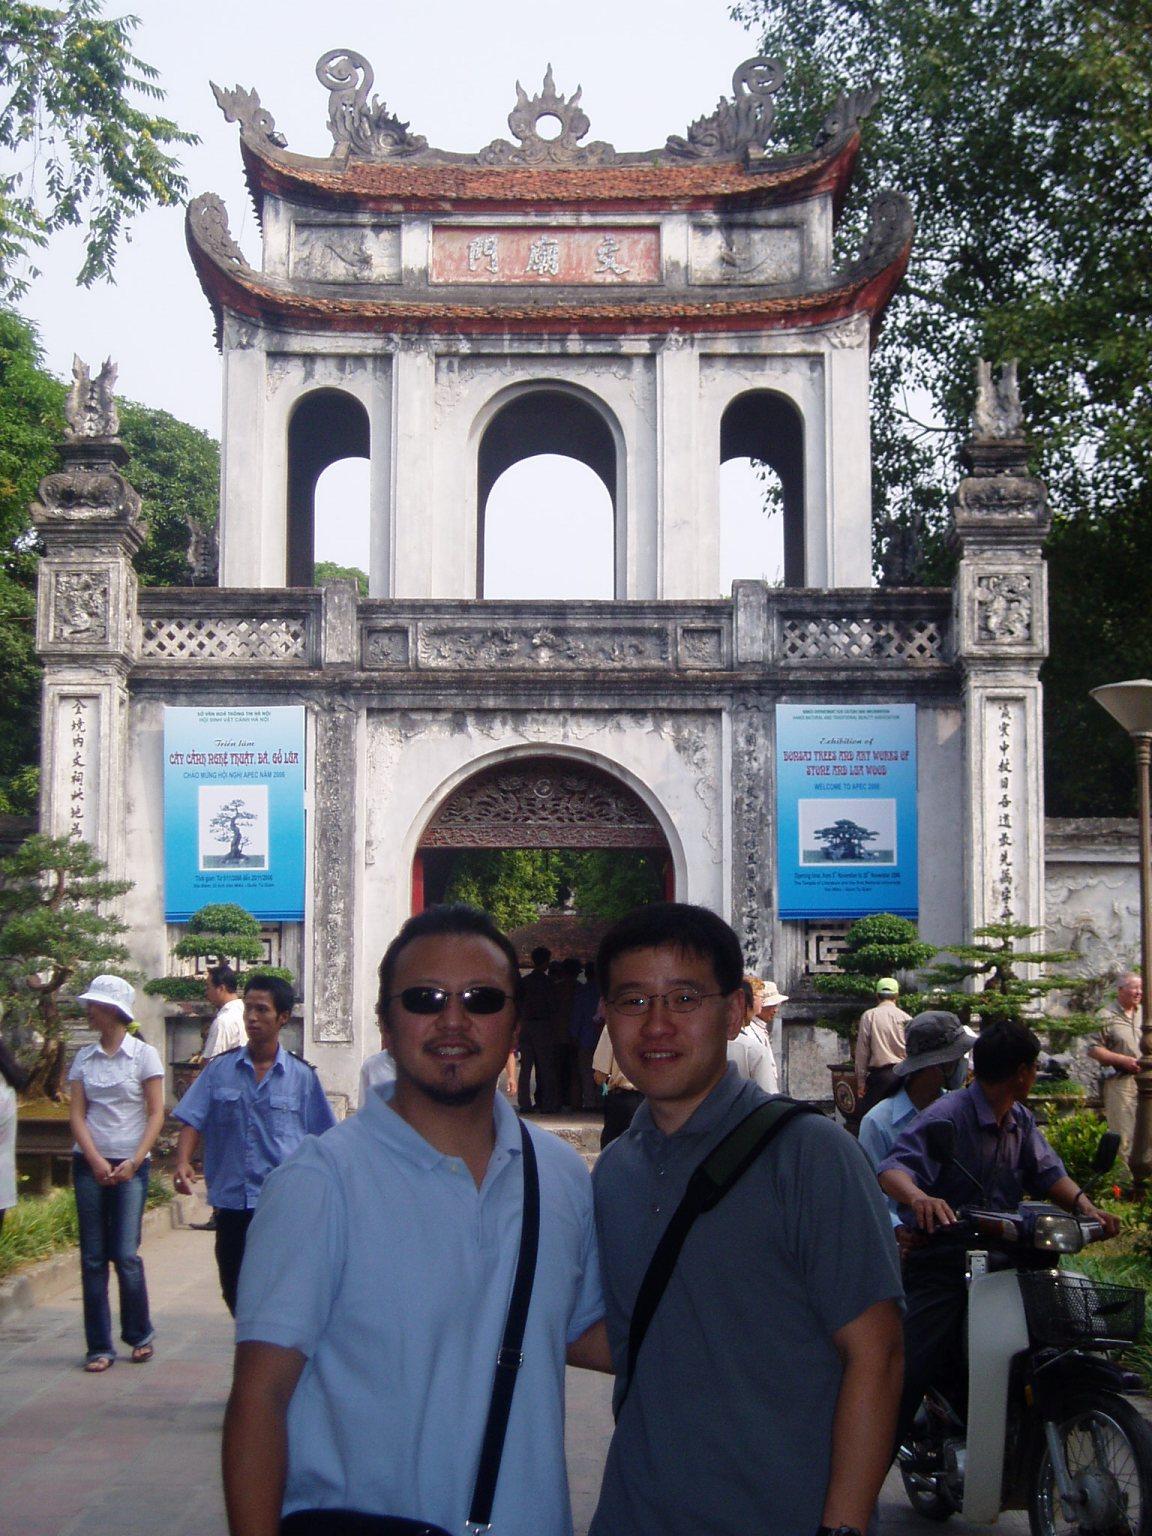 Ben and me - 1st University.JPG